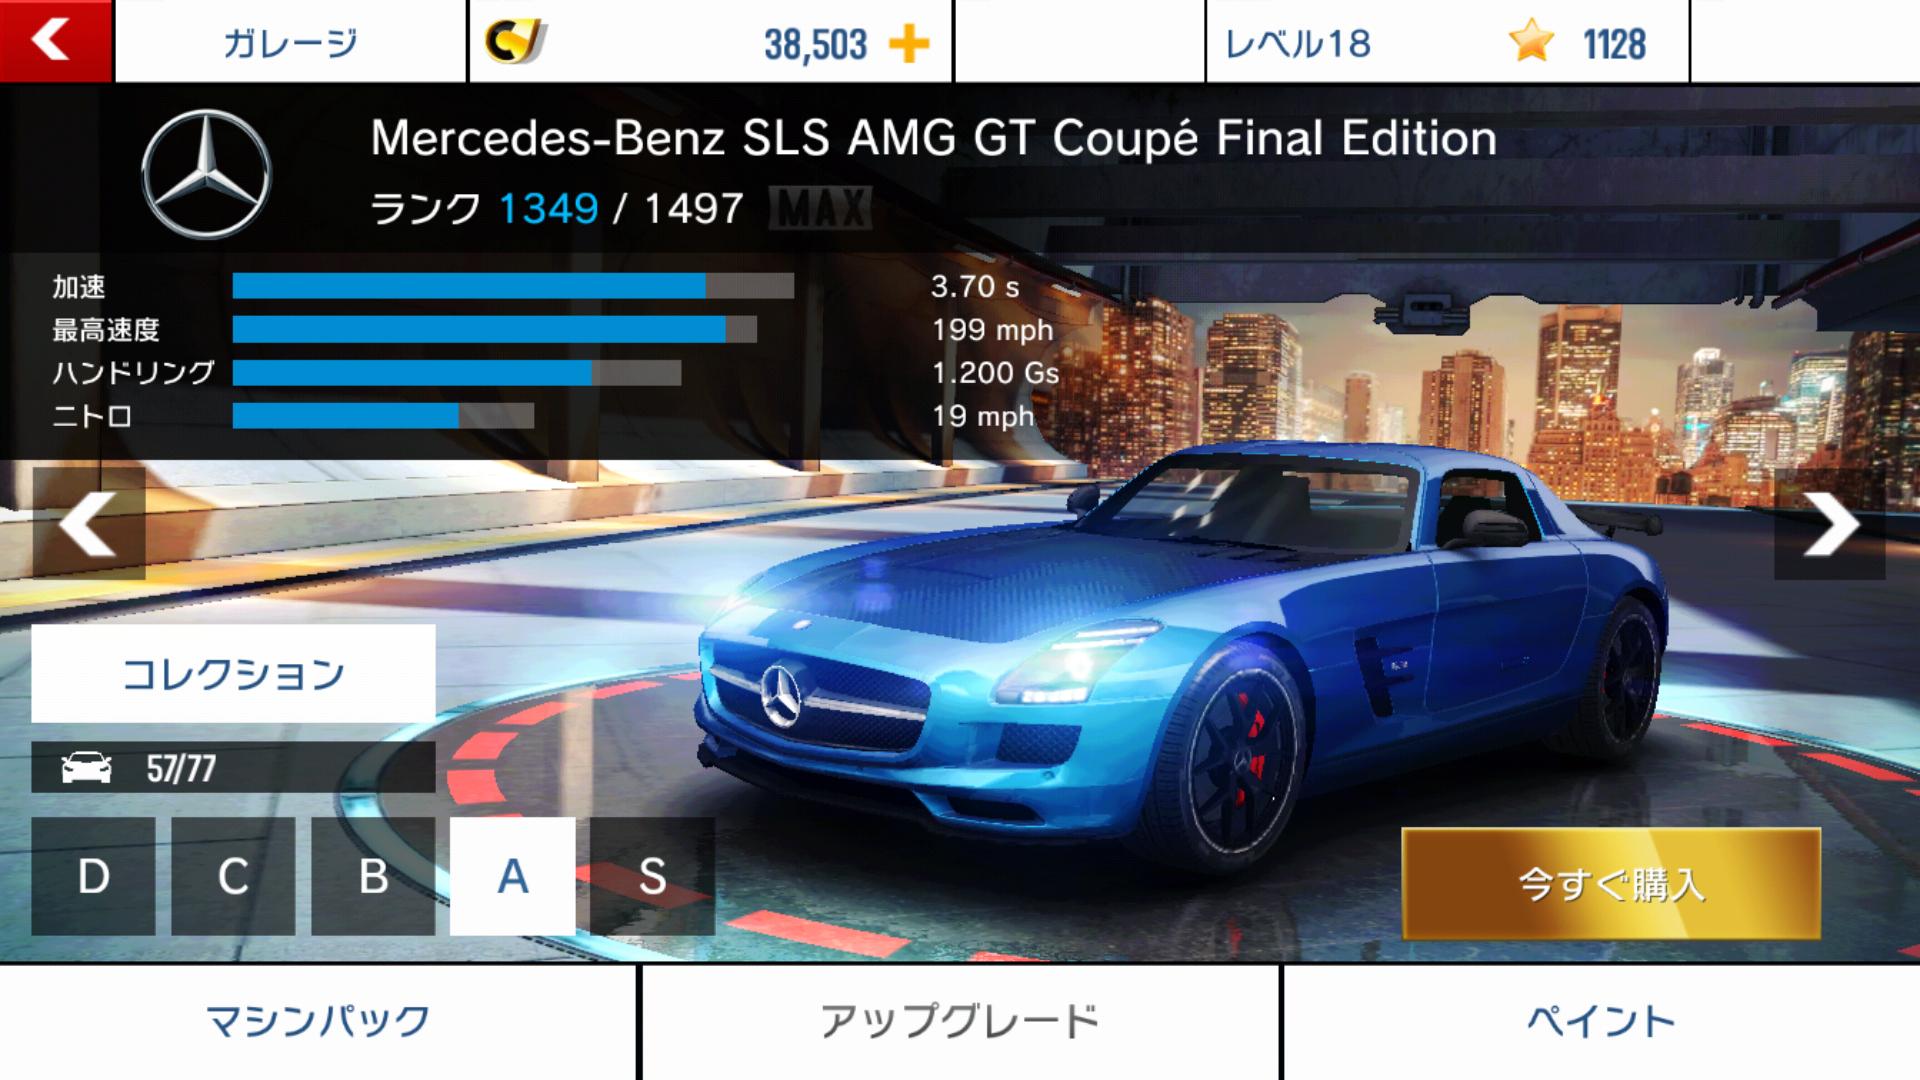 mercedes benz sls amg gt coup final edition asphalt wiki fandom powered by wikia - Mercedes Benz Silver Lightning Real